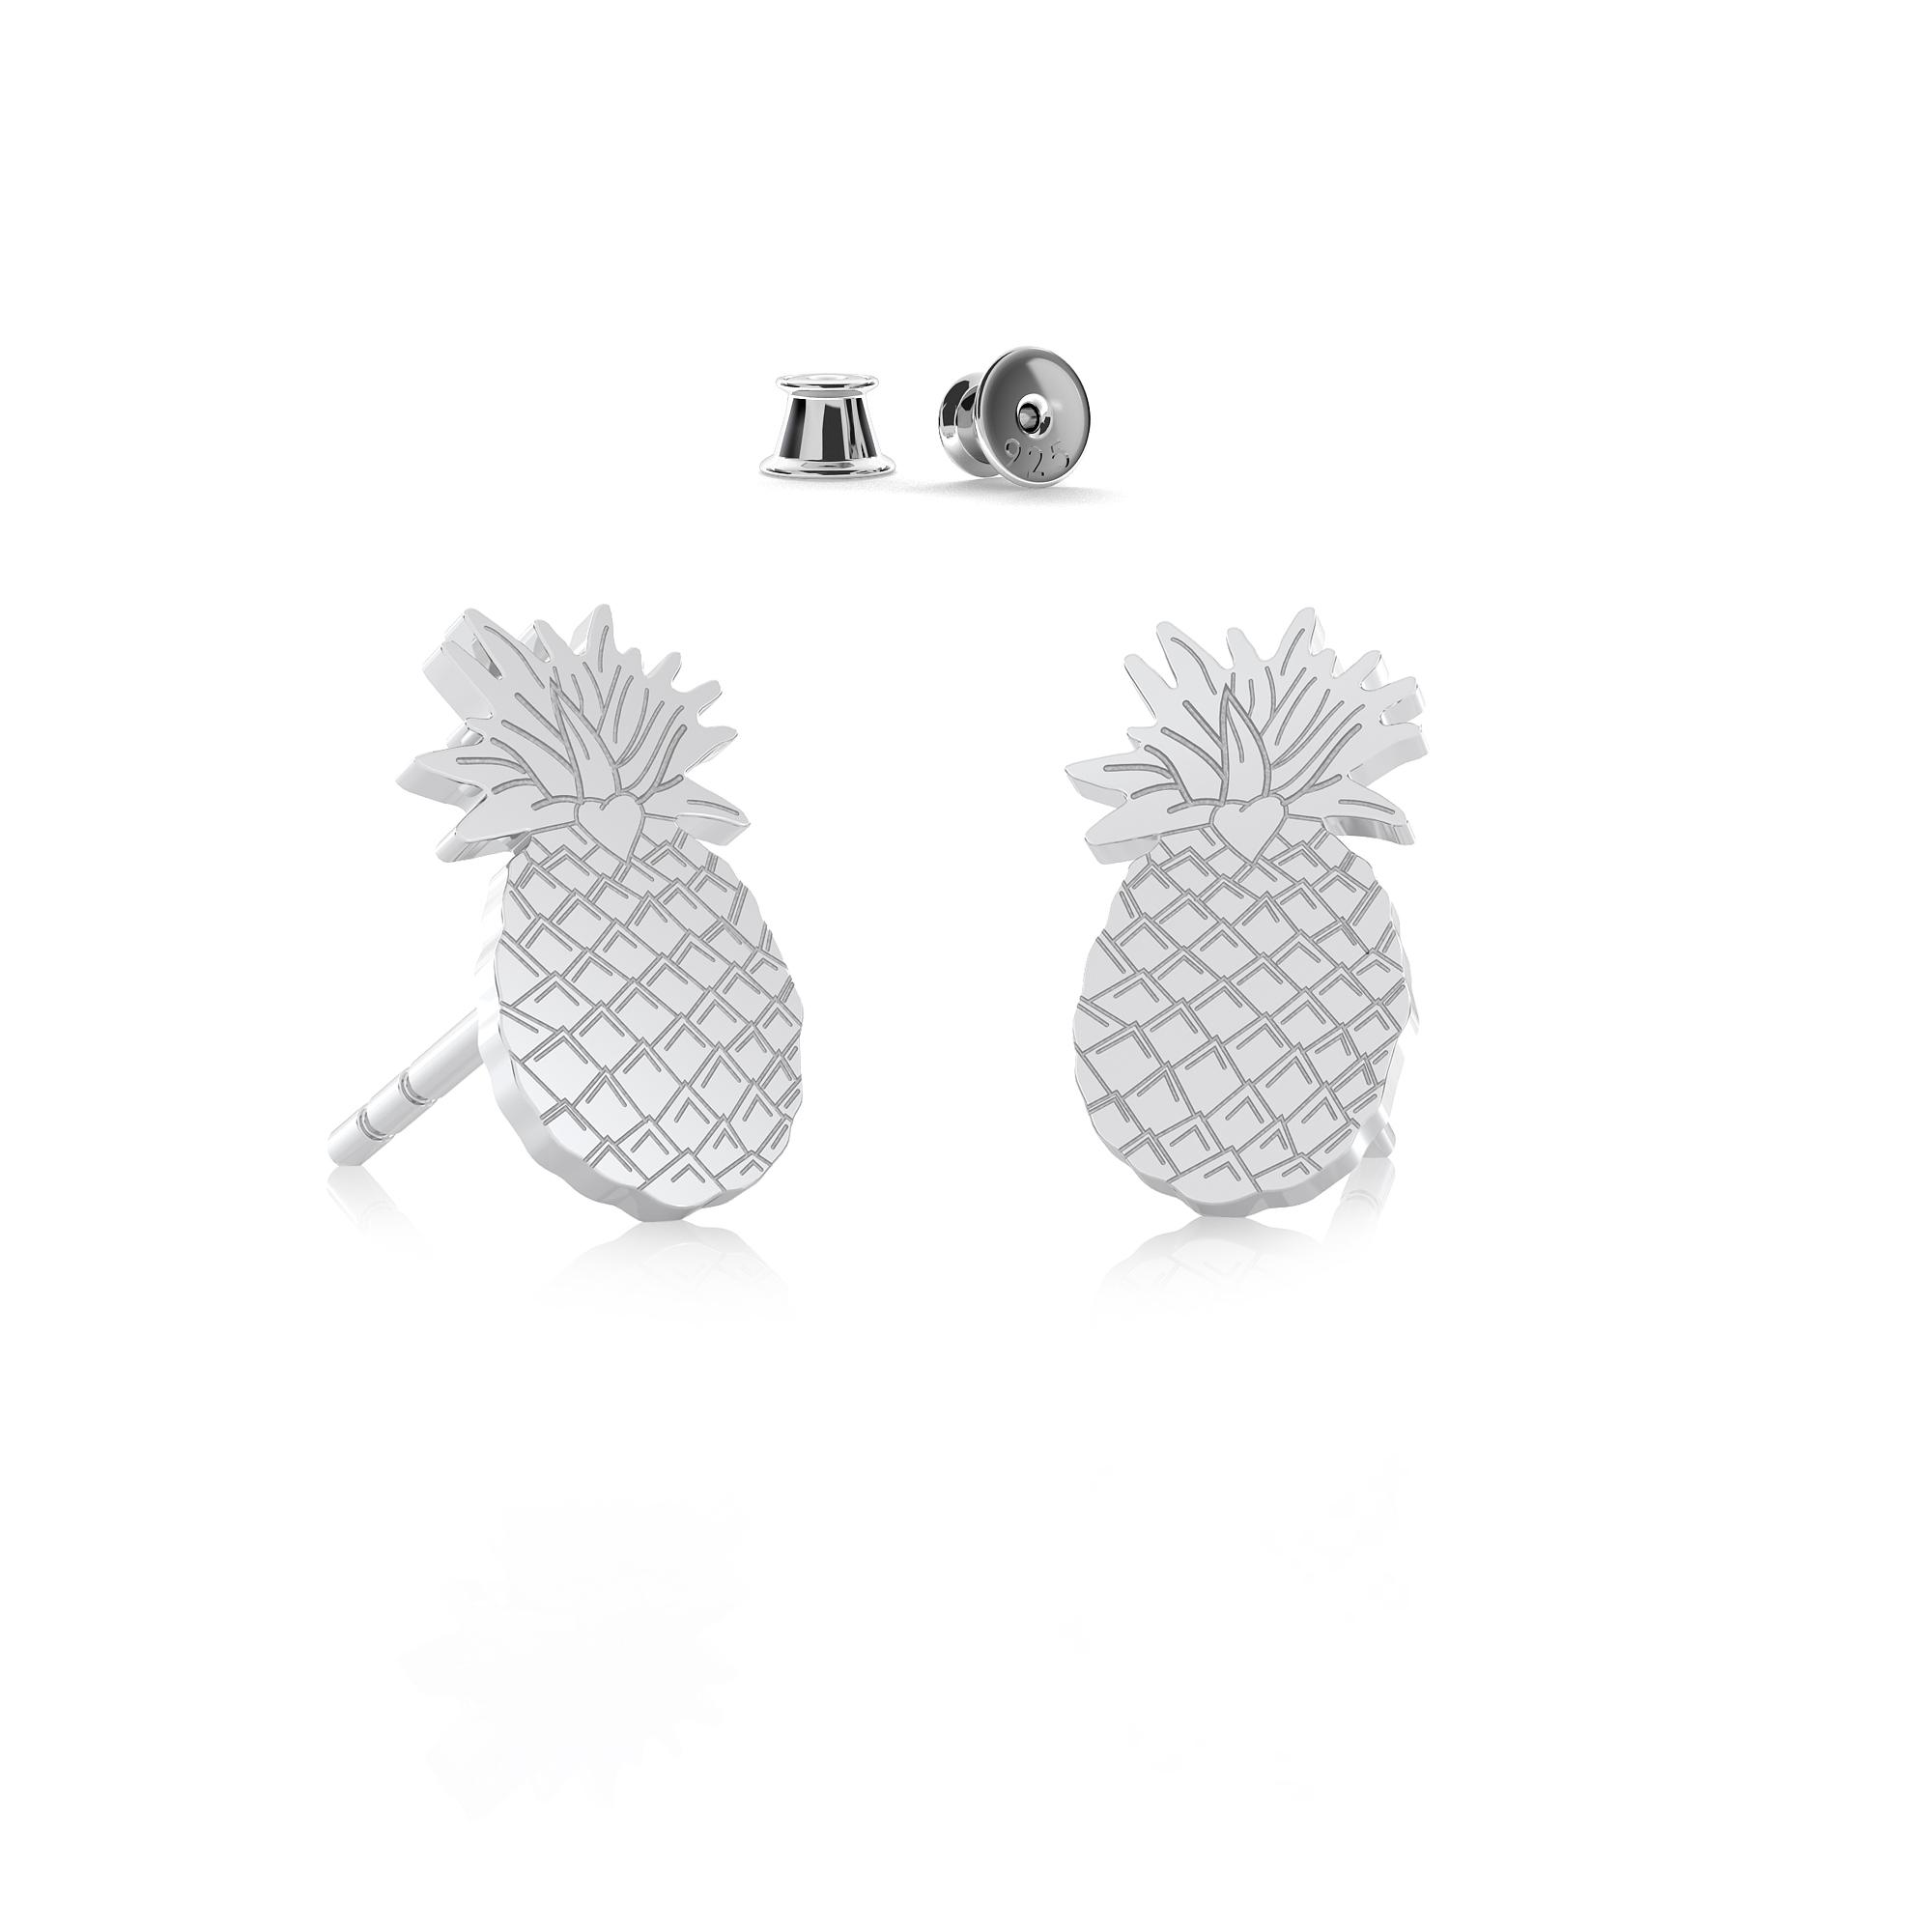 Ice cream earrings sterling silver 925